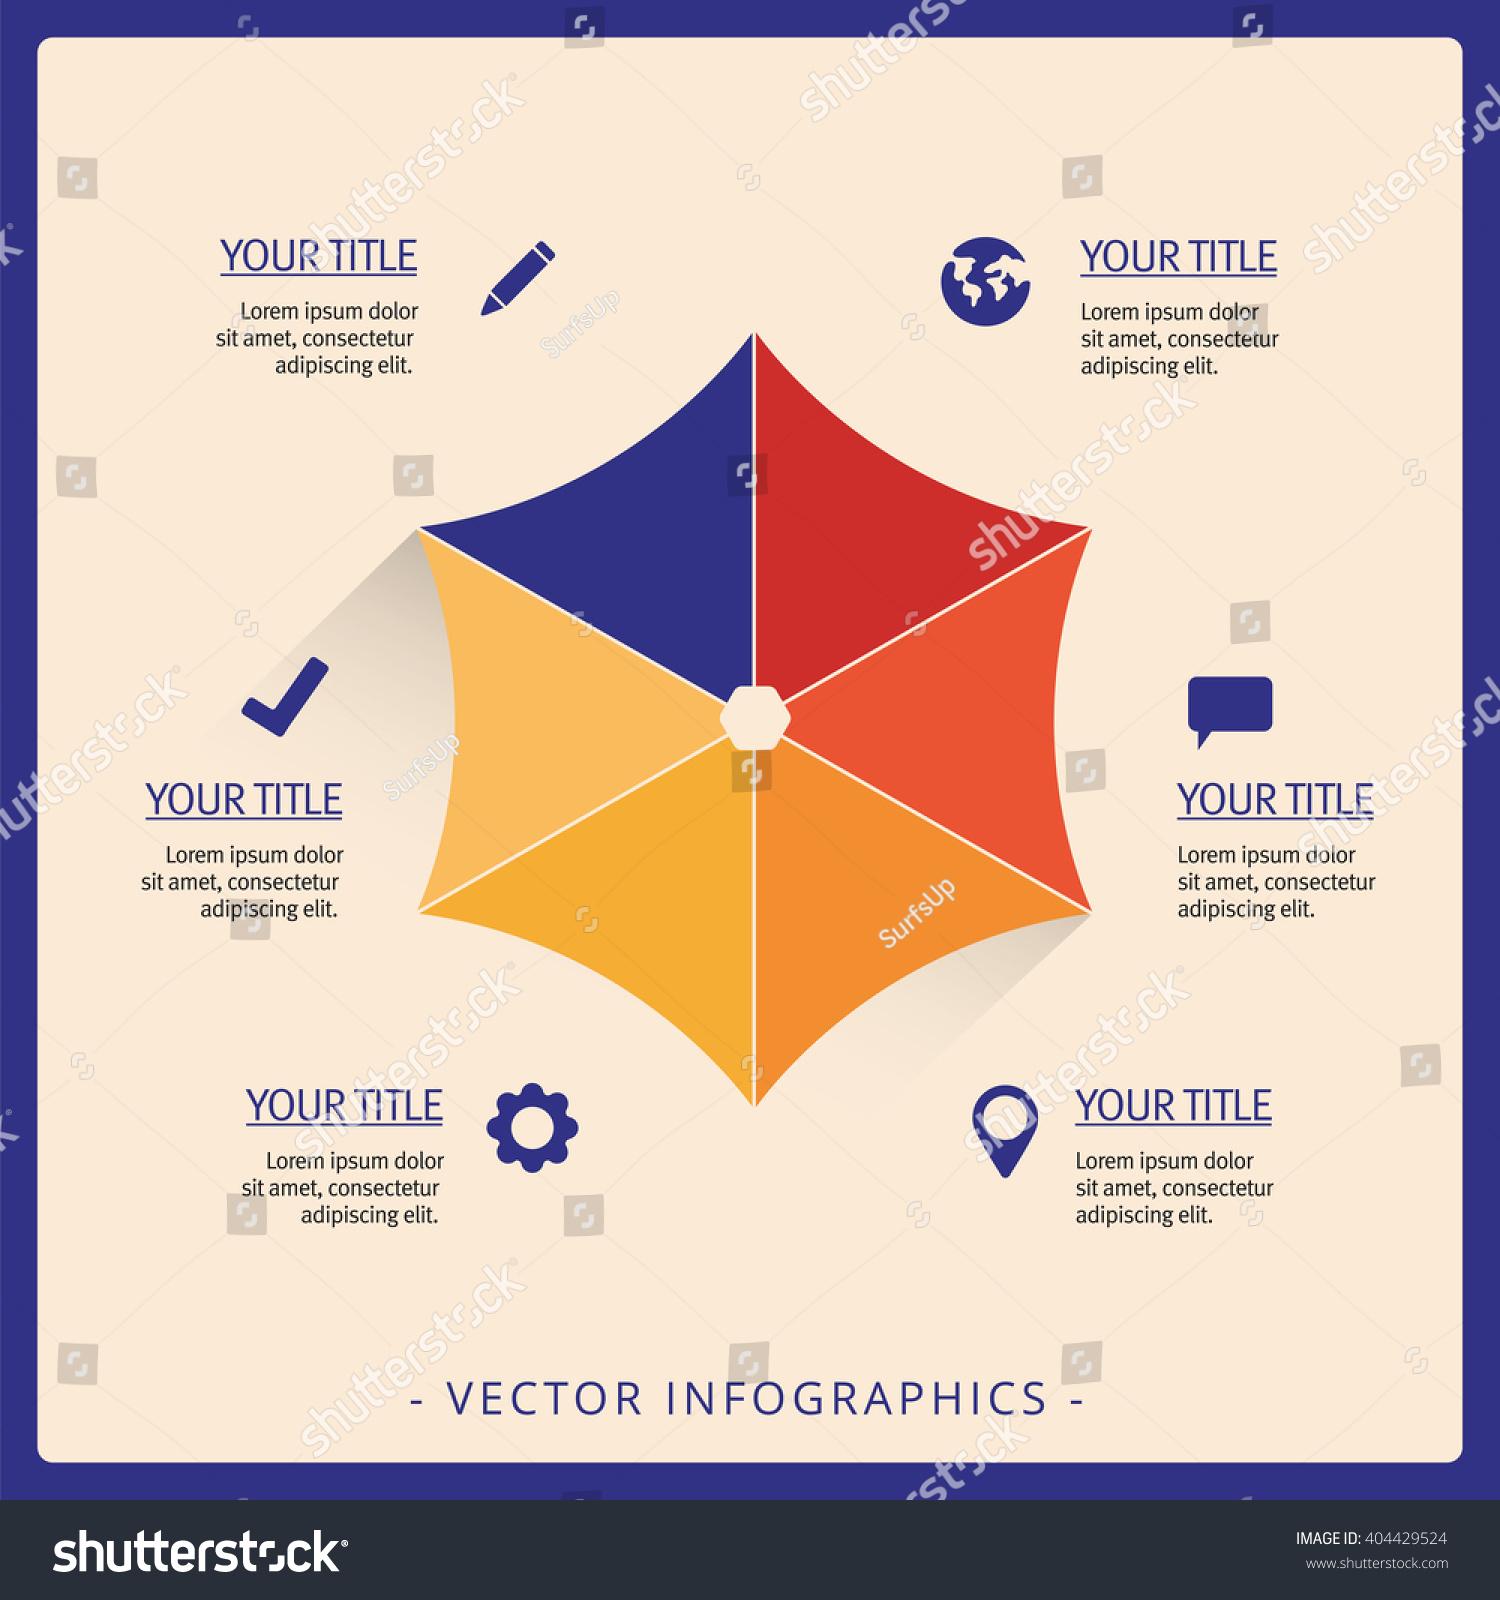 Umbrella Diagram Template Stock Vector 404429524 - Shutterstock